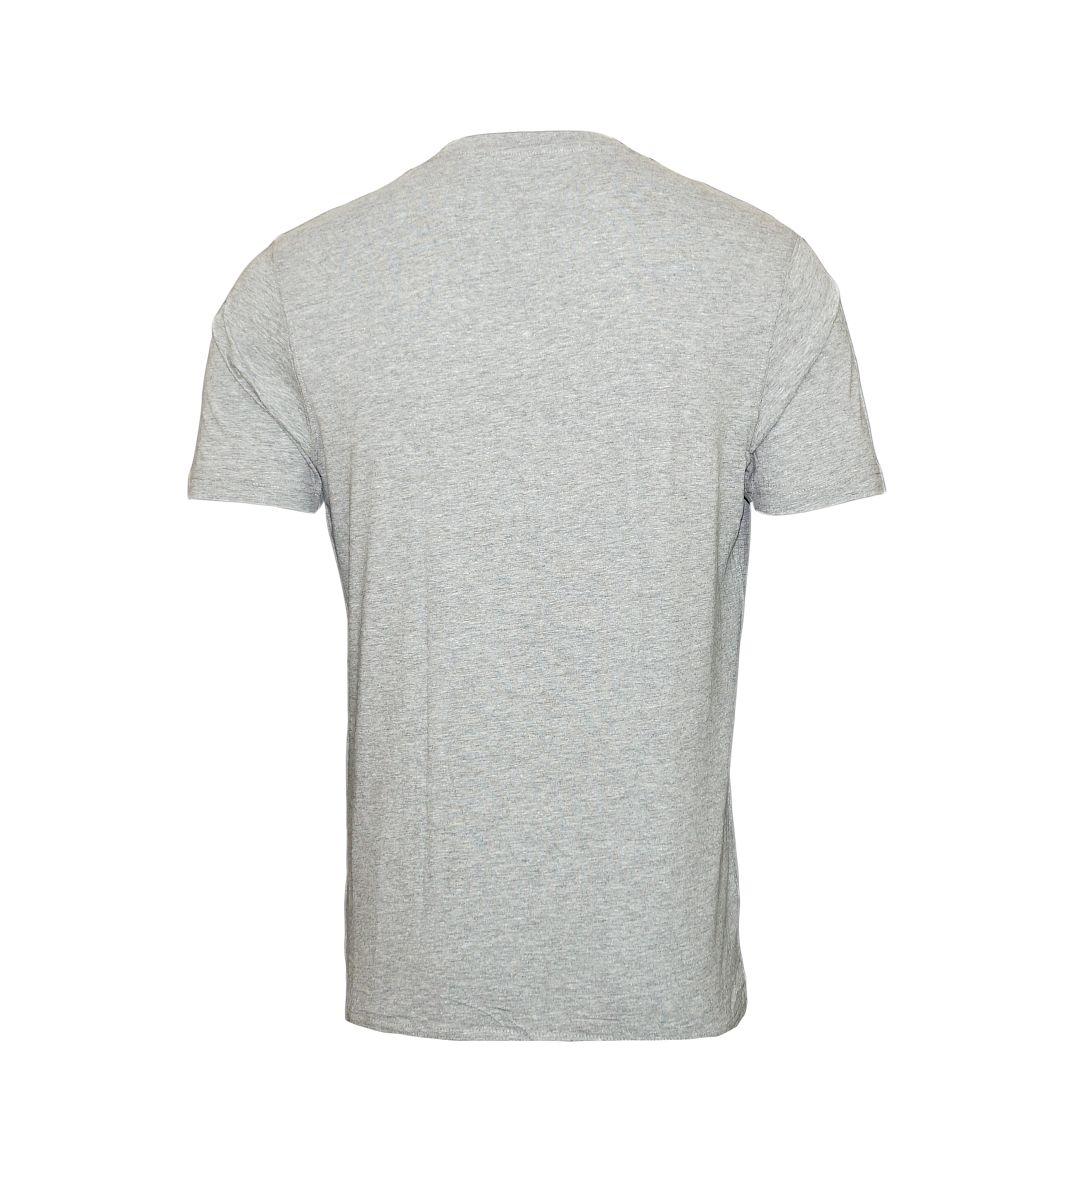 Daniel Hechter 2er Pack T-Shirts Rundhals 76001 172972 910 grau SH17-DH2P